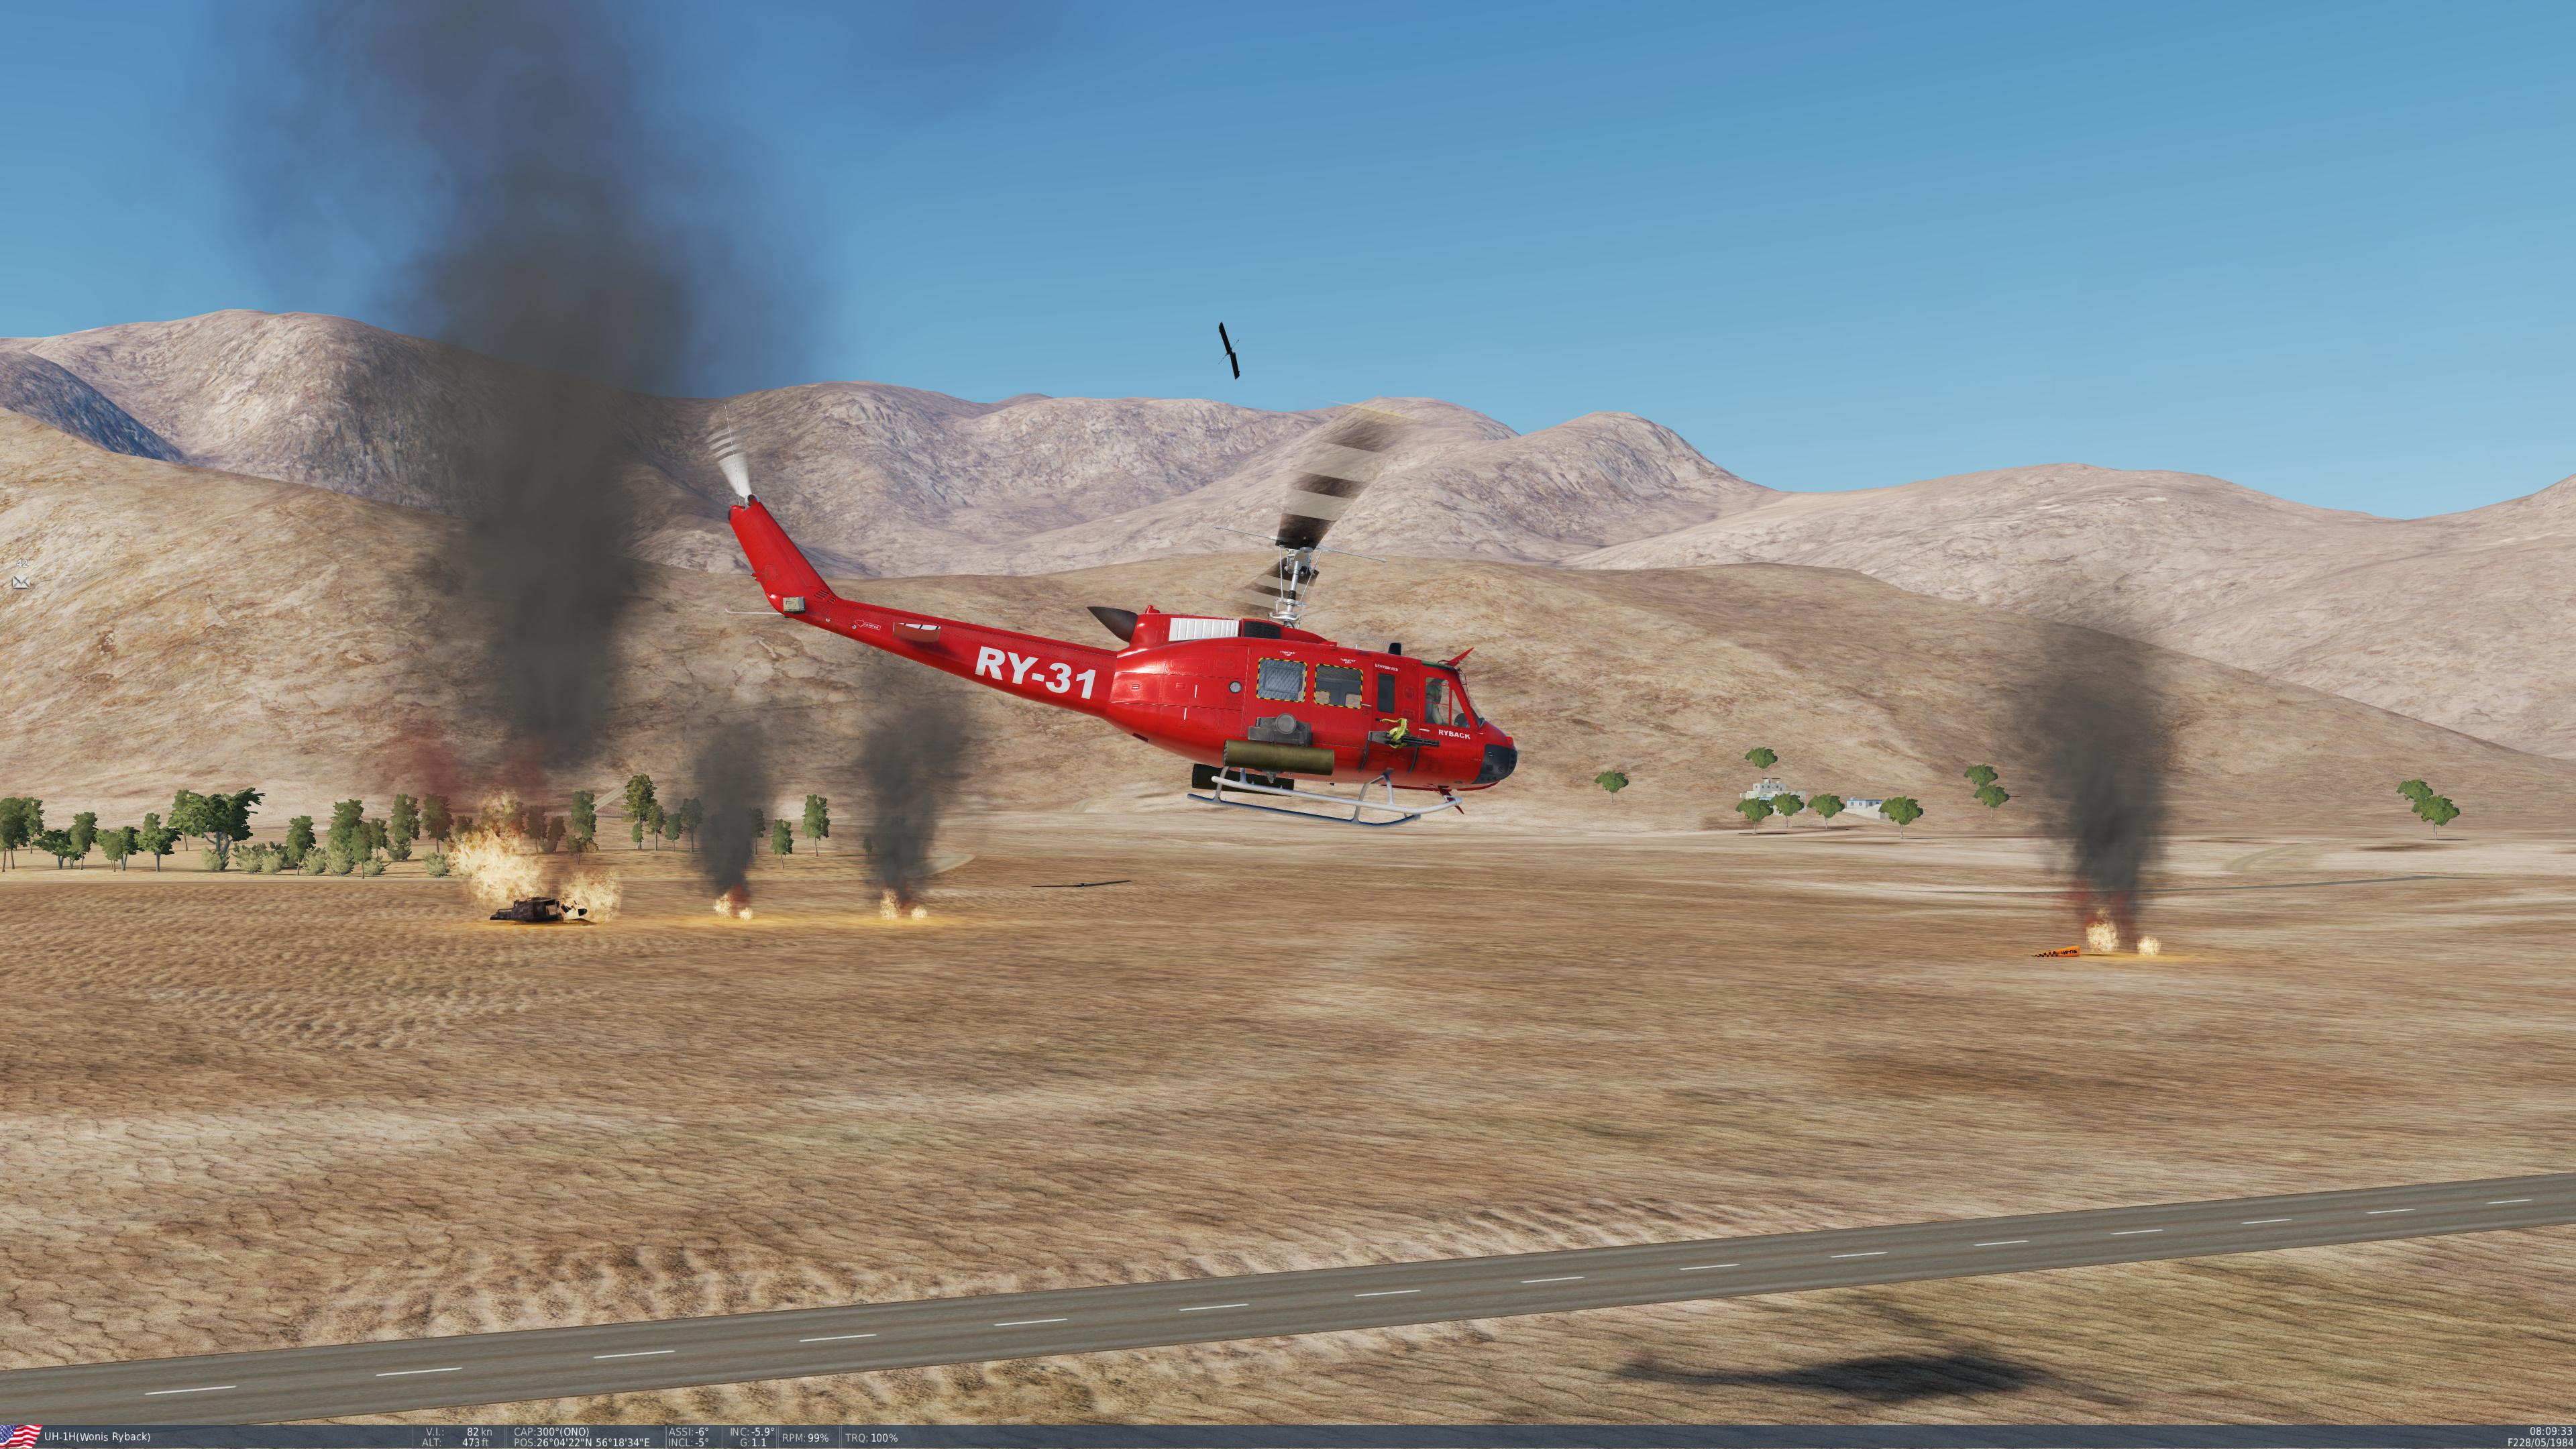 [Cursus UH-1H Huey] Photos de nos missions Bandicam_2021-01-26_22-16-23-700